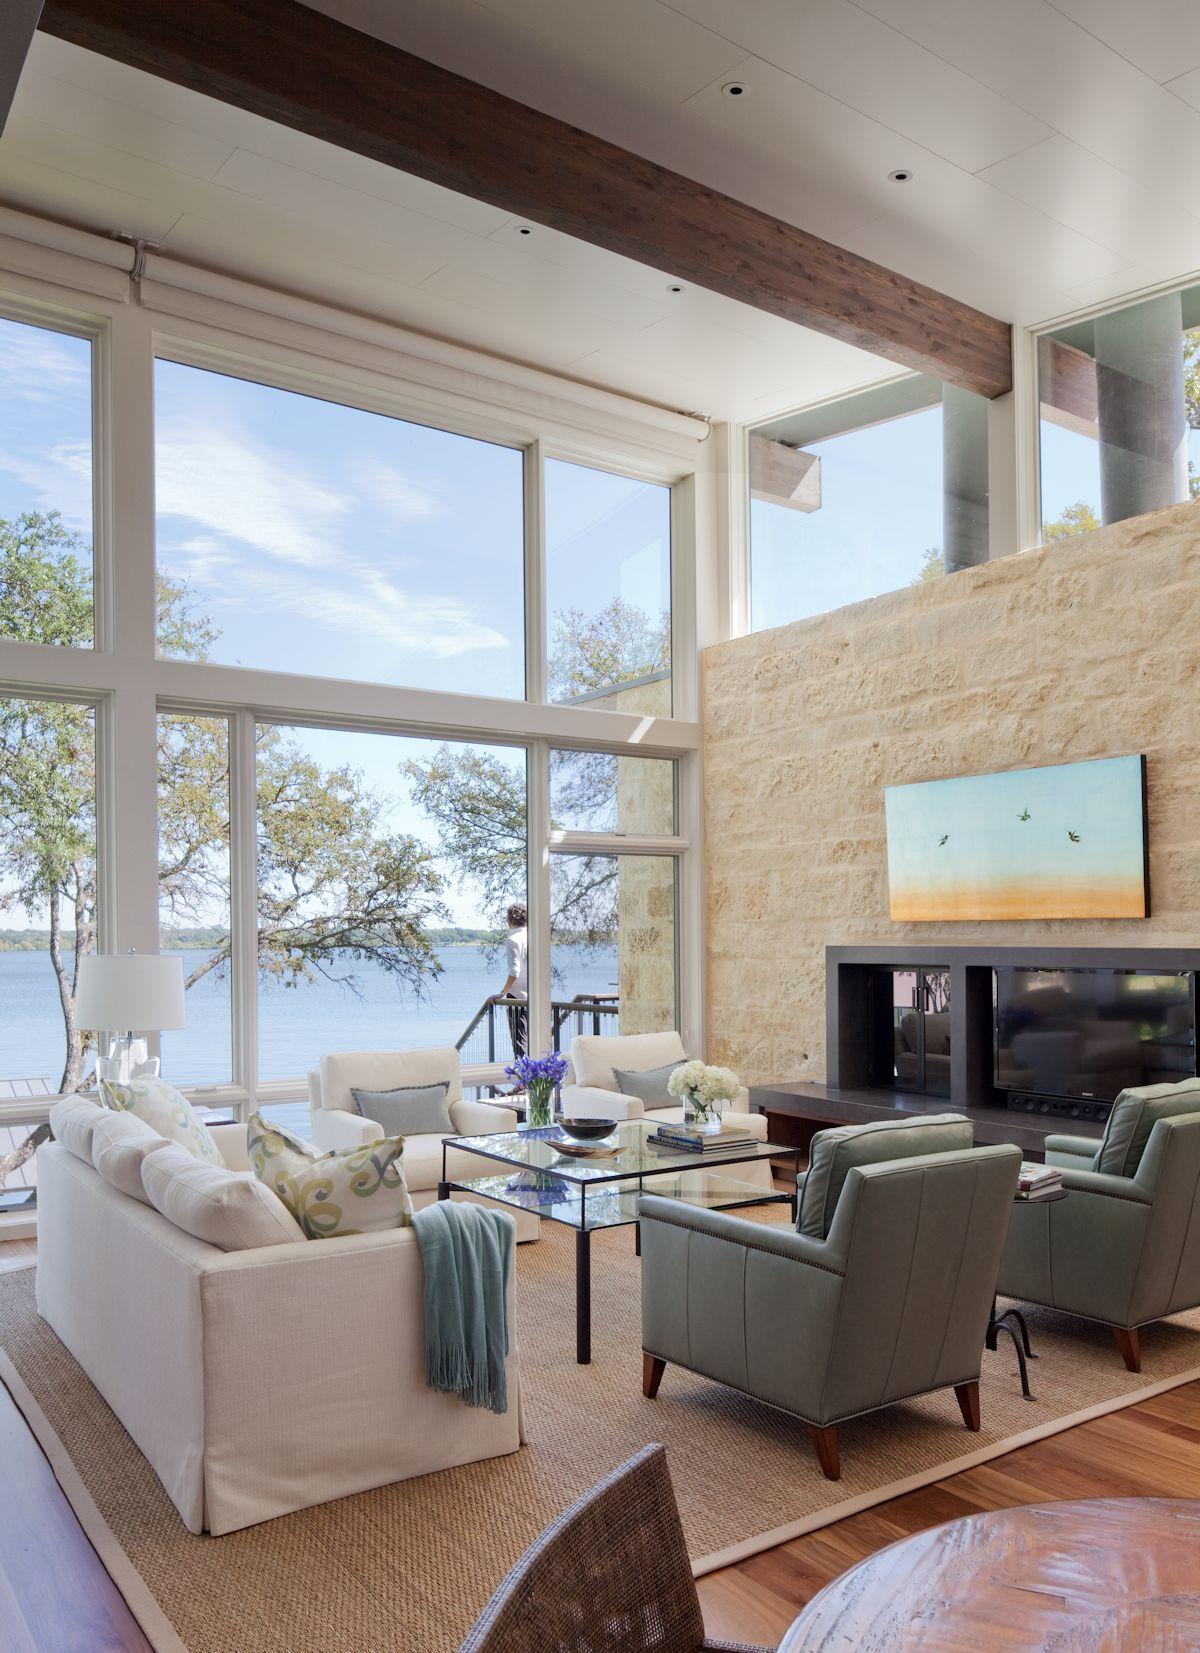 Floor-to-Ceiling Windows, Sofas, Fireplace, Lake Views, Weekend Retreat in Marble Falls, Texas